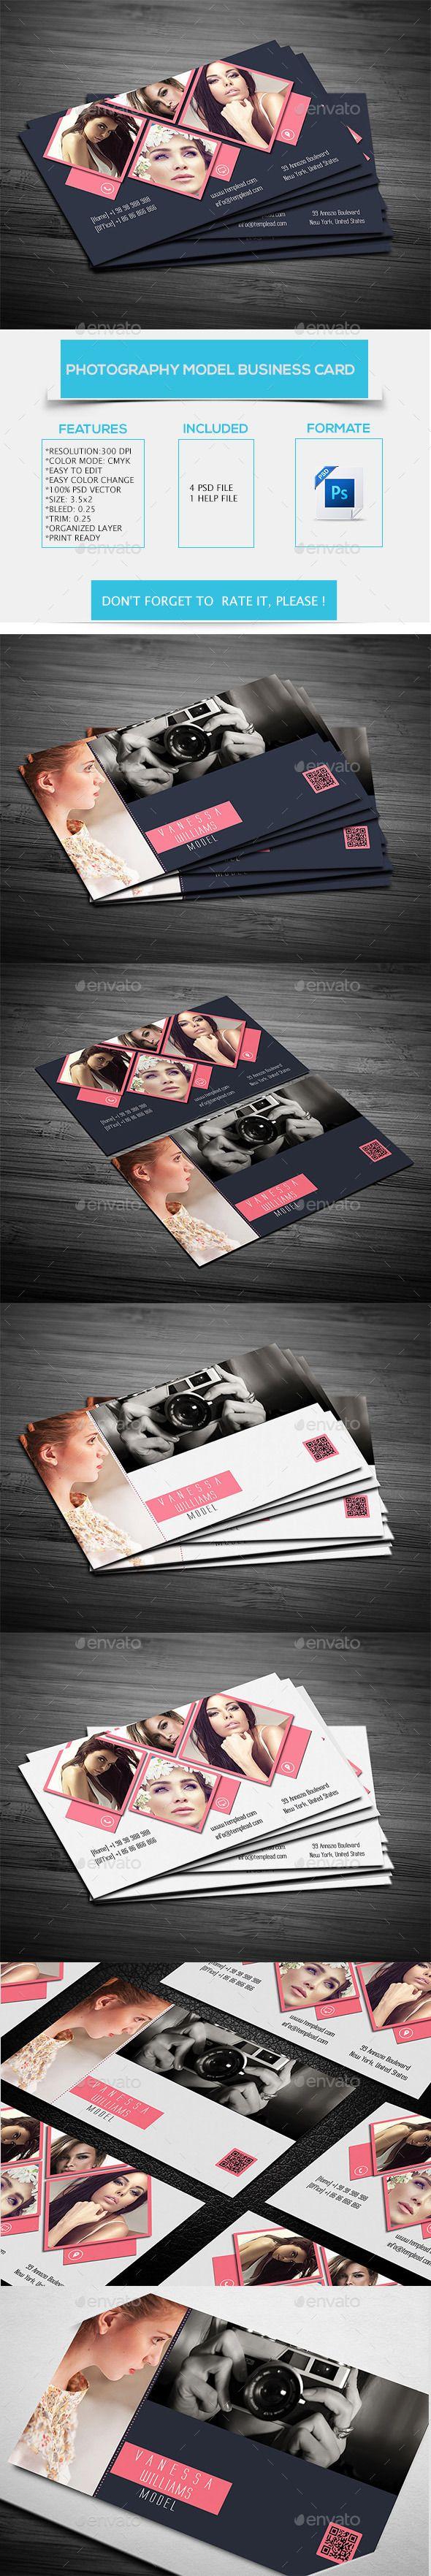 Photography Model Business Card Template #design #visitenkarte Download: http://graphicriver.net/item/photography-model-business-card-/12290157?ref=ksioks